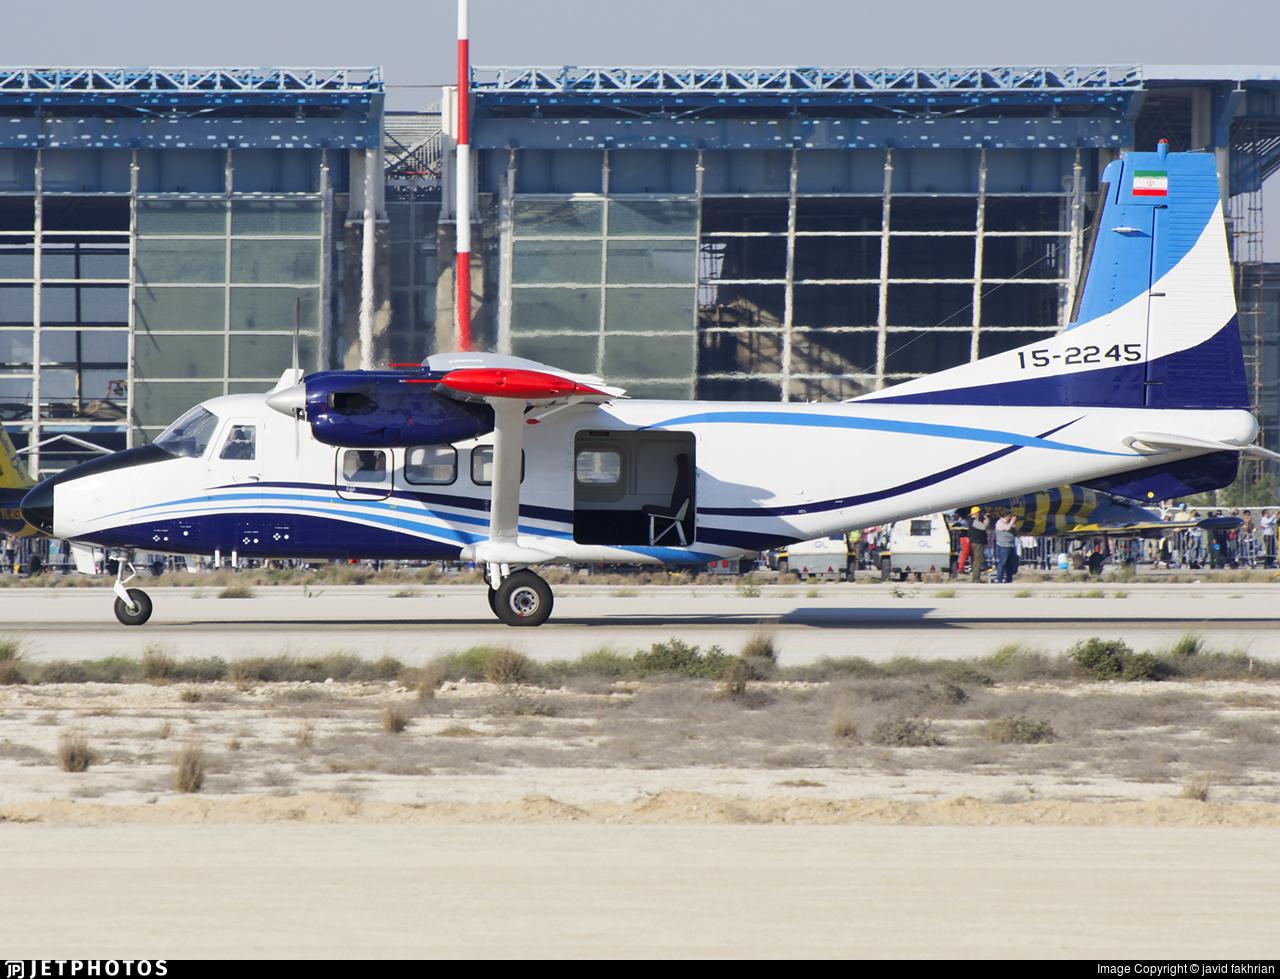 15-2245 - Harbin Y-12 II - Iran - Revolutionary Guard